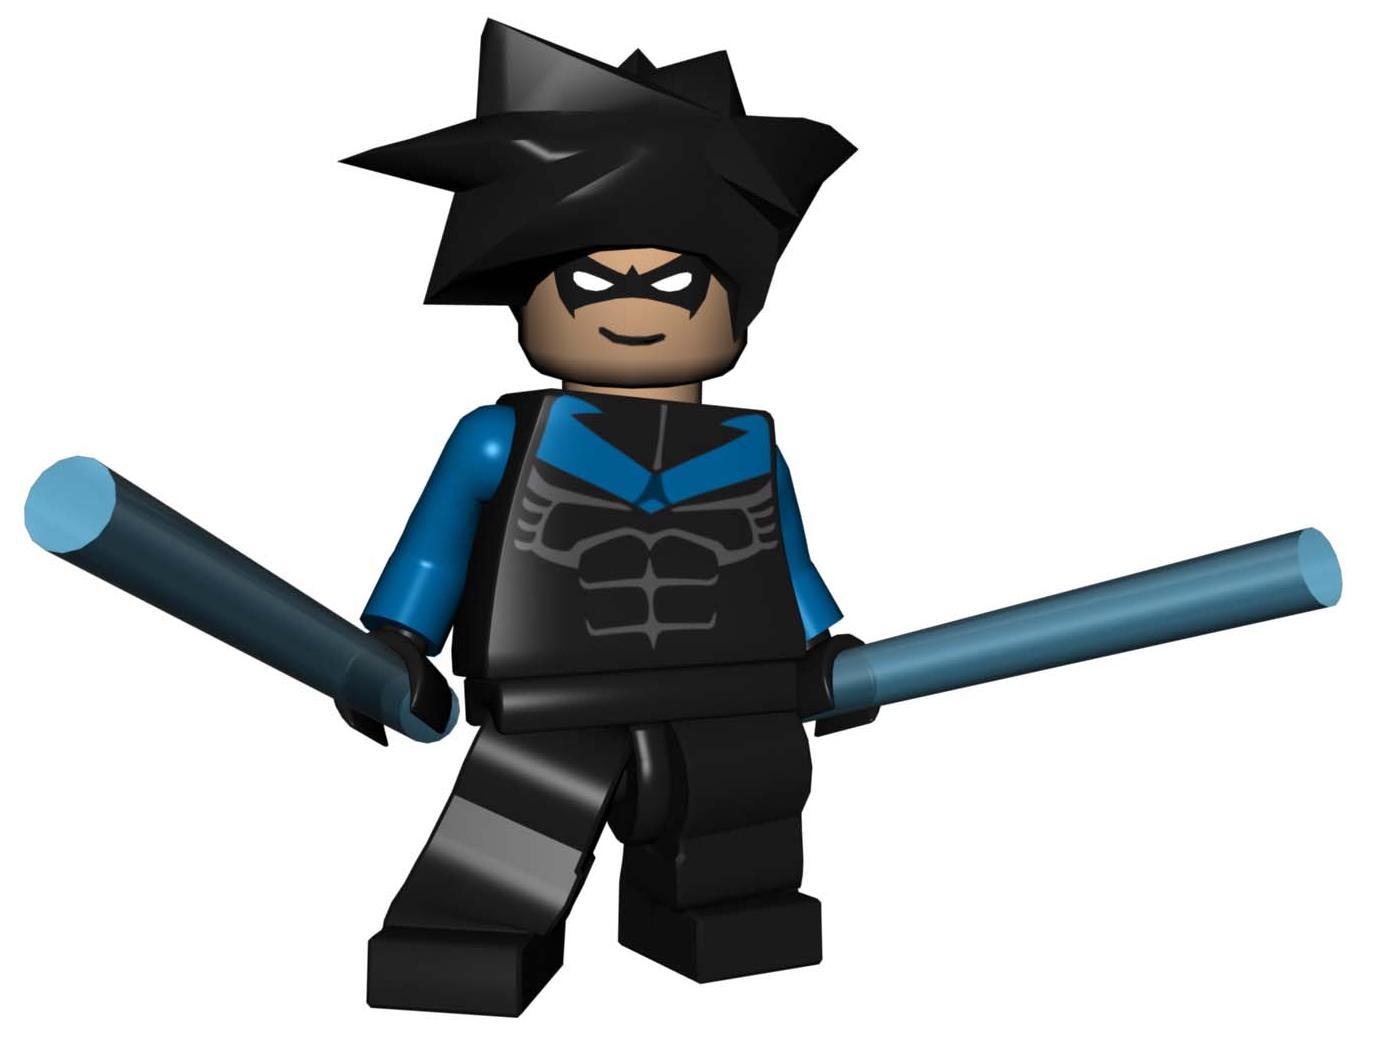 Lego batman wall decals high resolution photographs